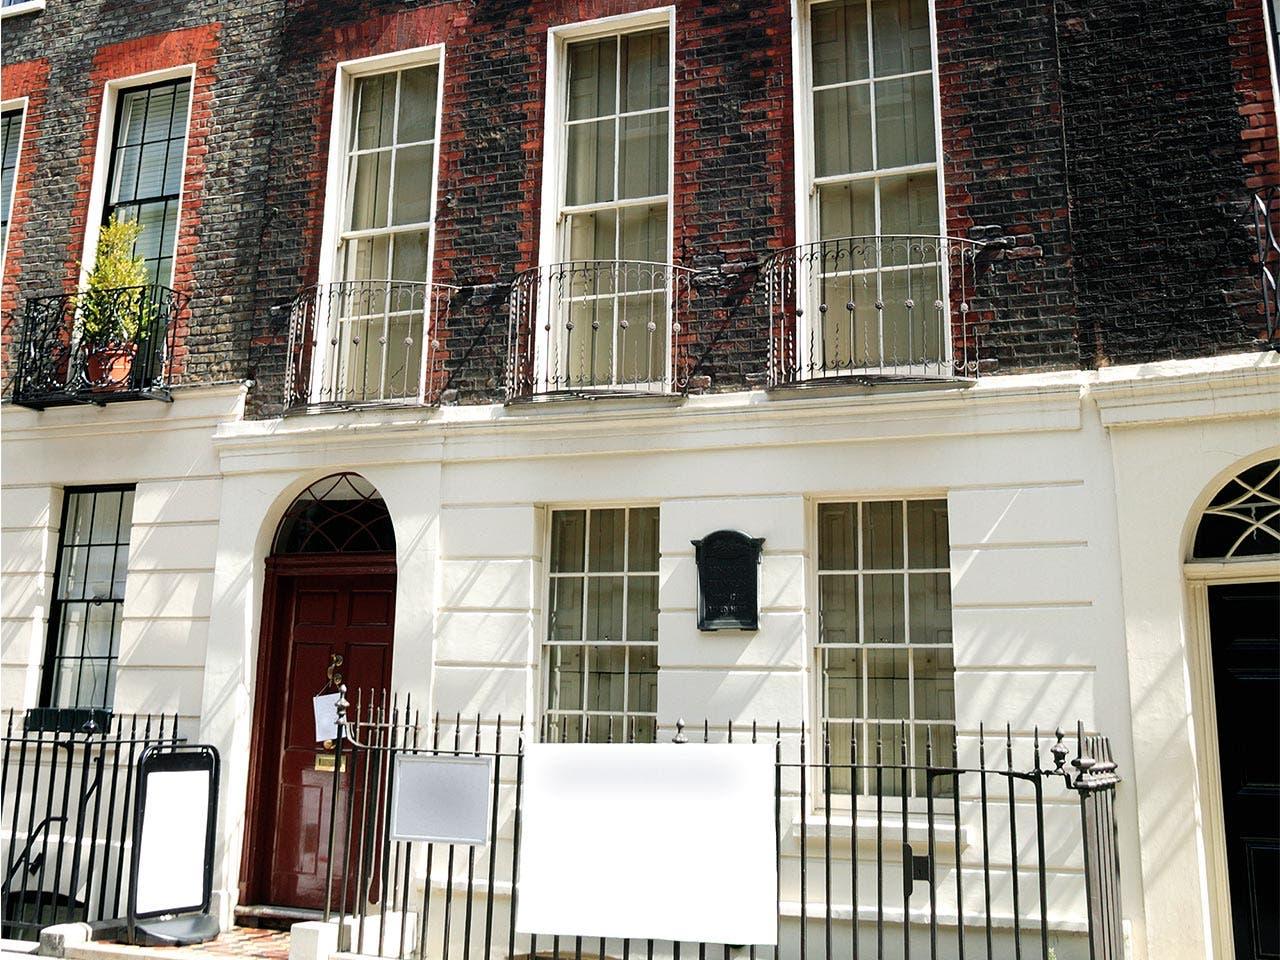 House of Benjamin Franklin | Tony Baggett/Shutterstock.com